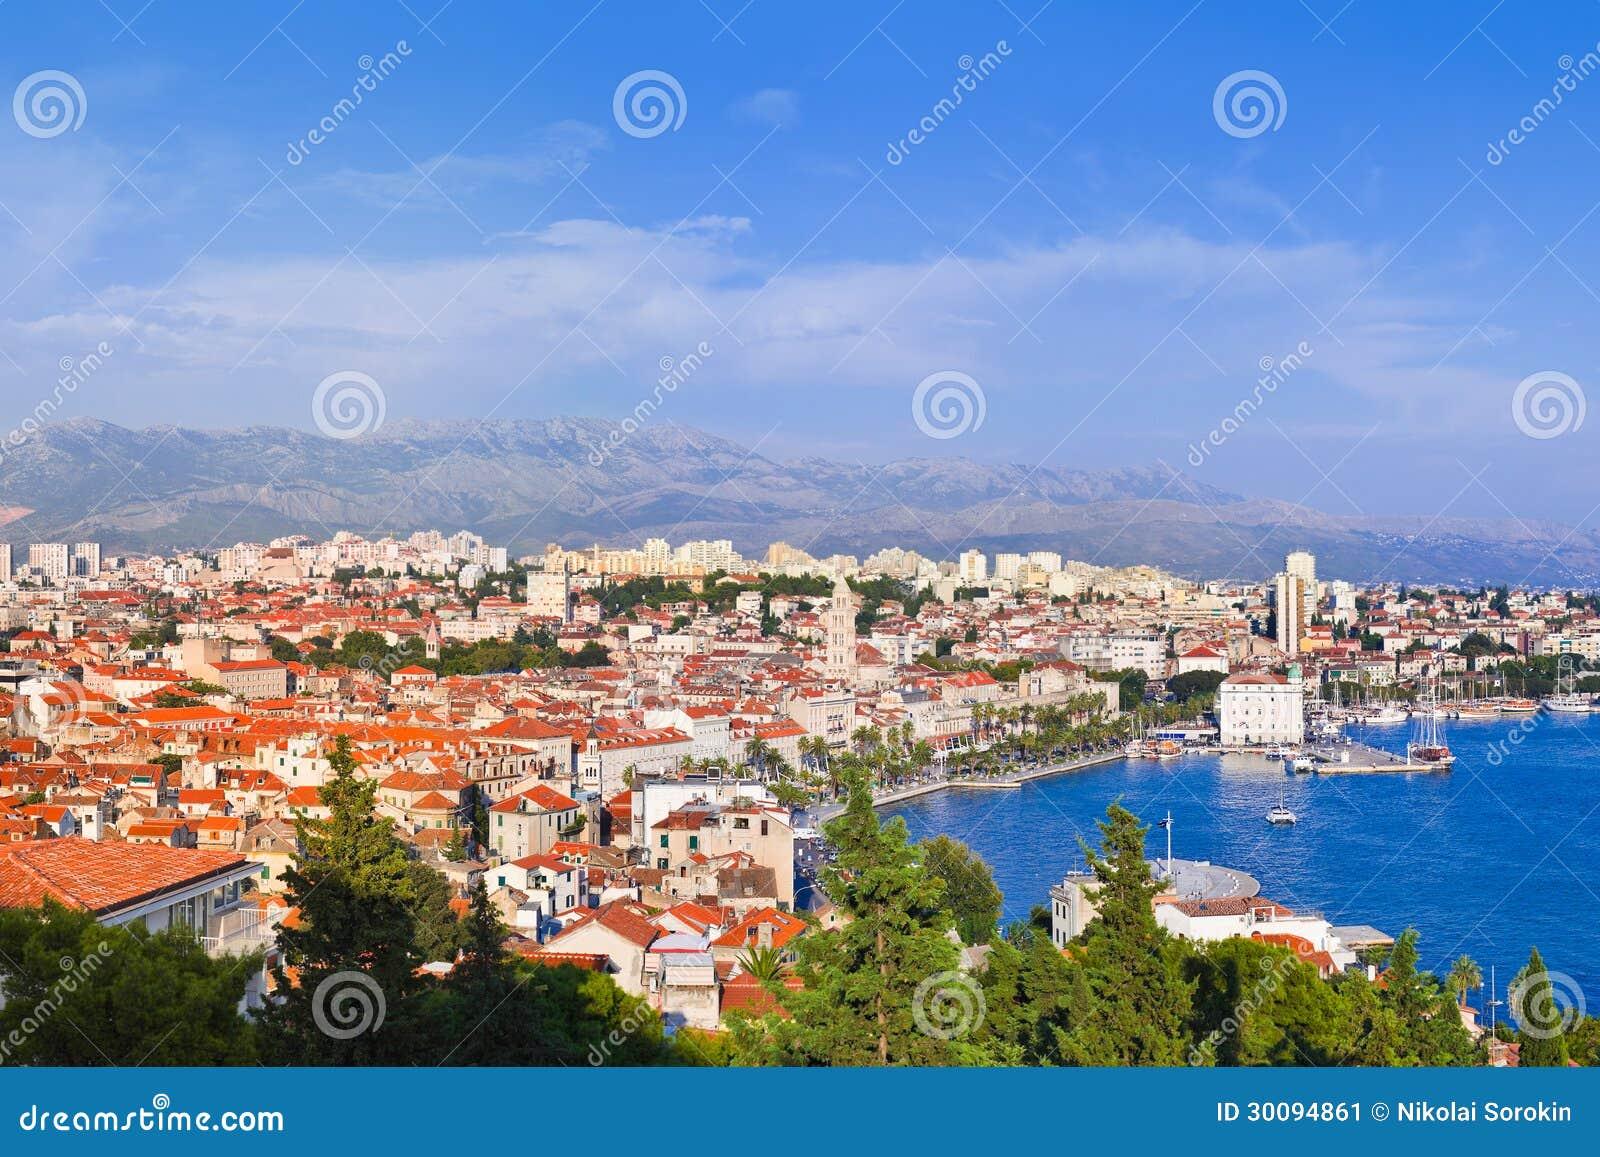 travel sea wallpaper panorama - photo #39